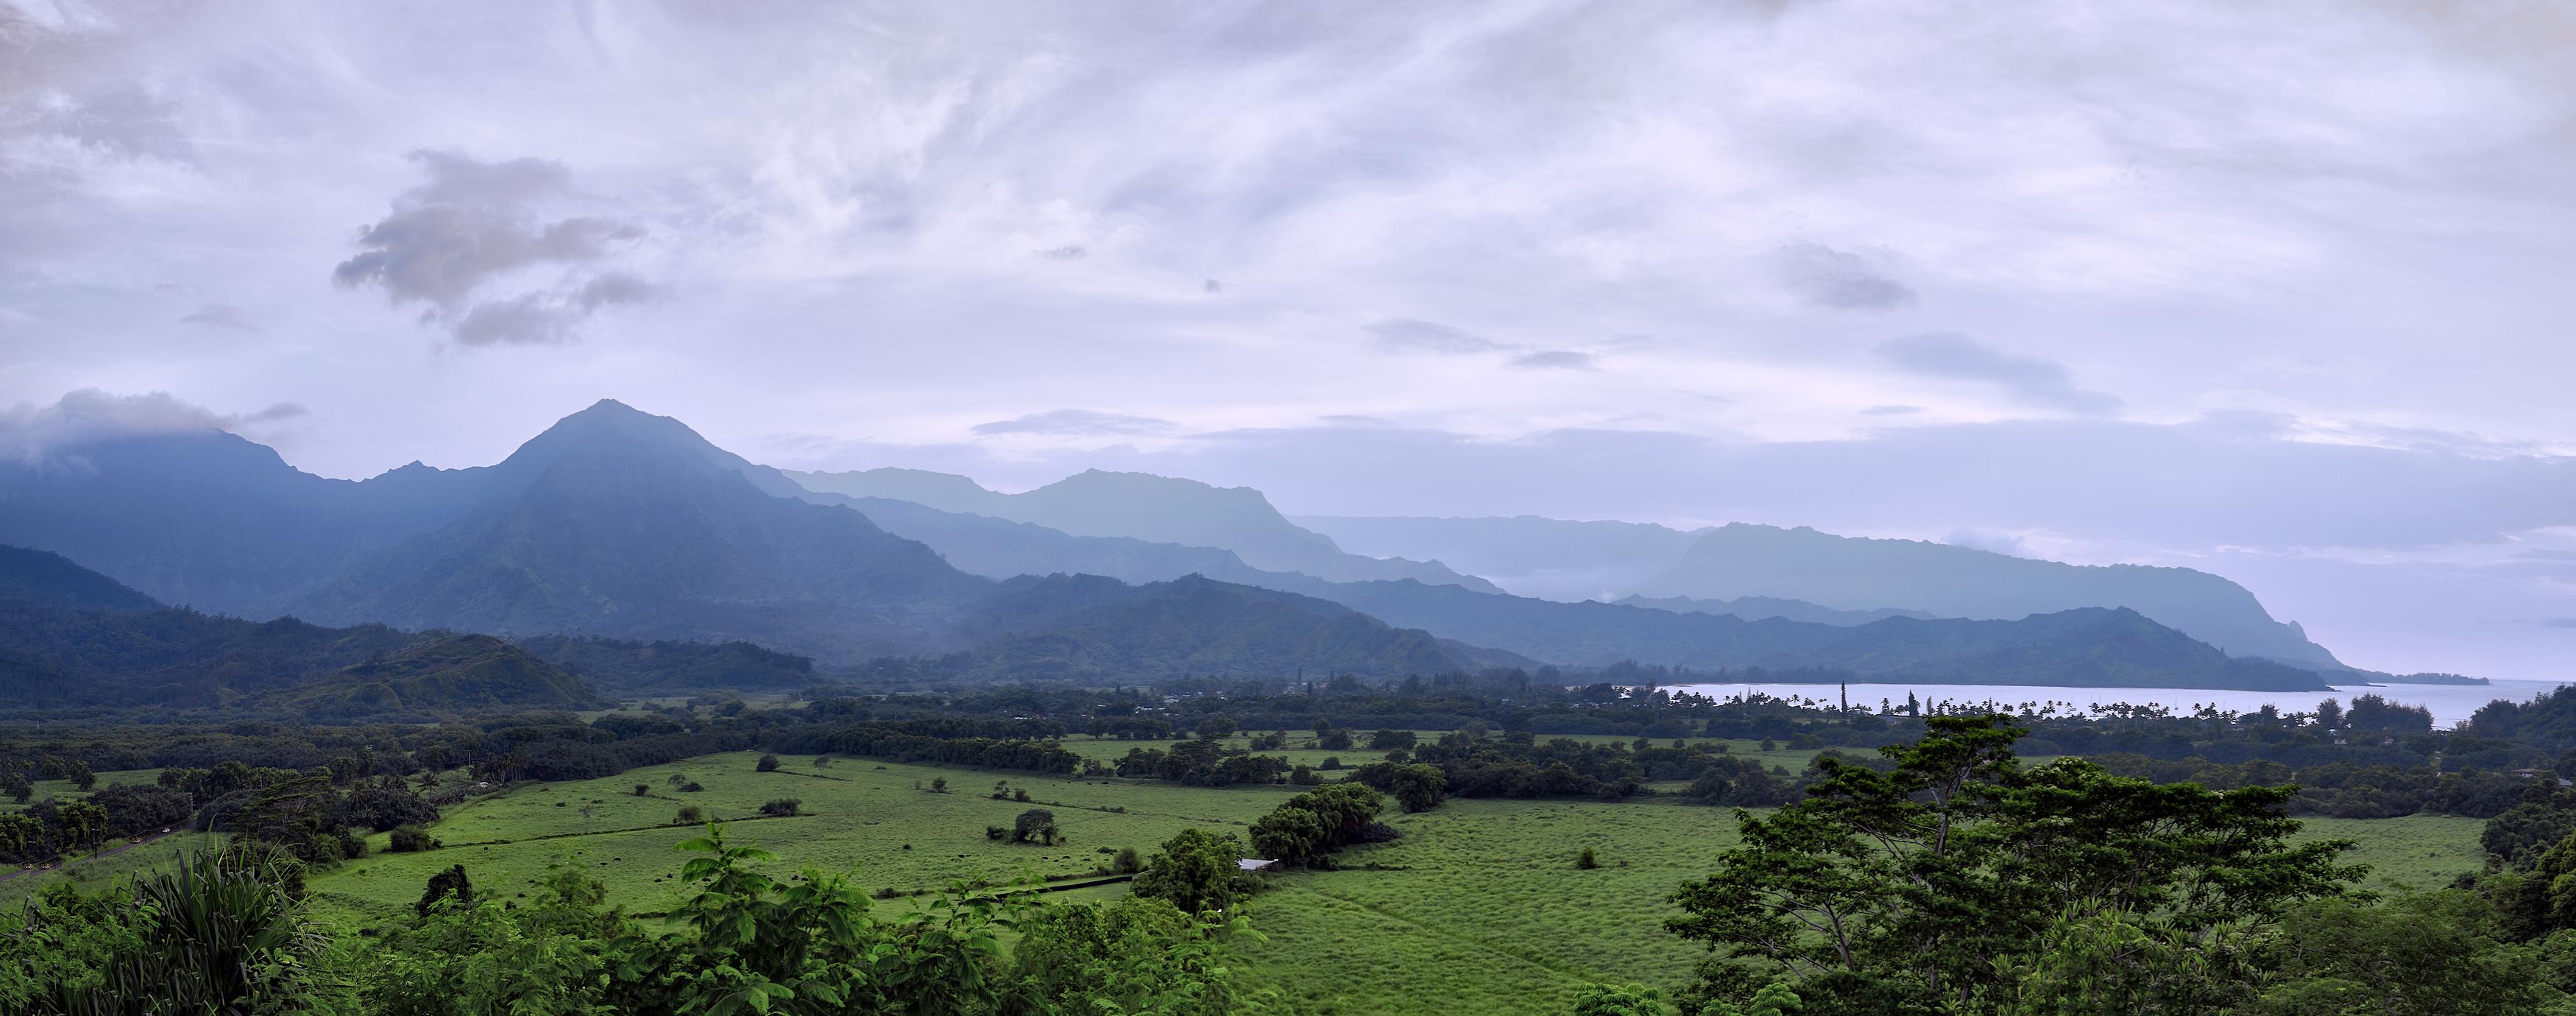 Hanalei Panorama by Peter Adams.